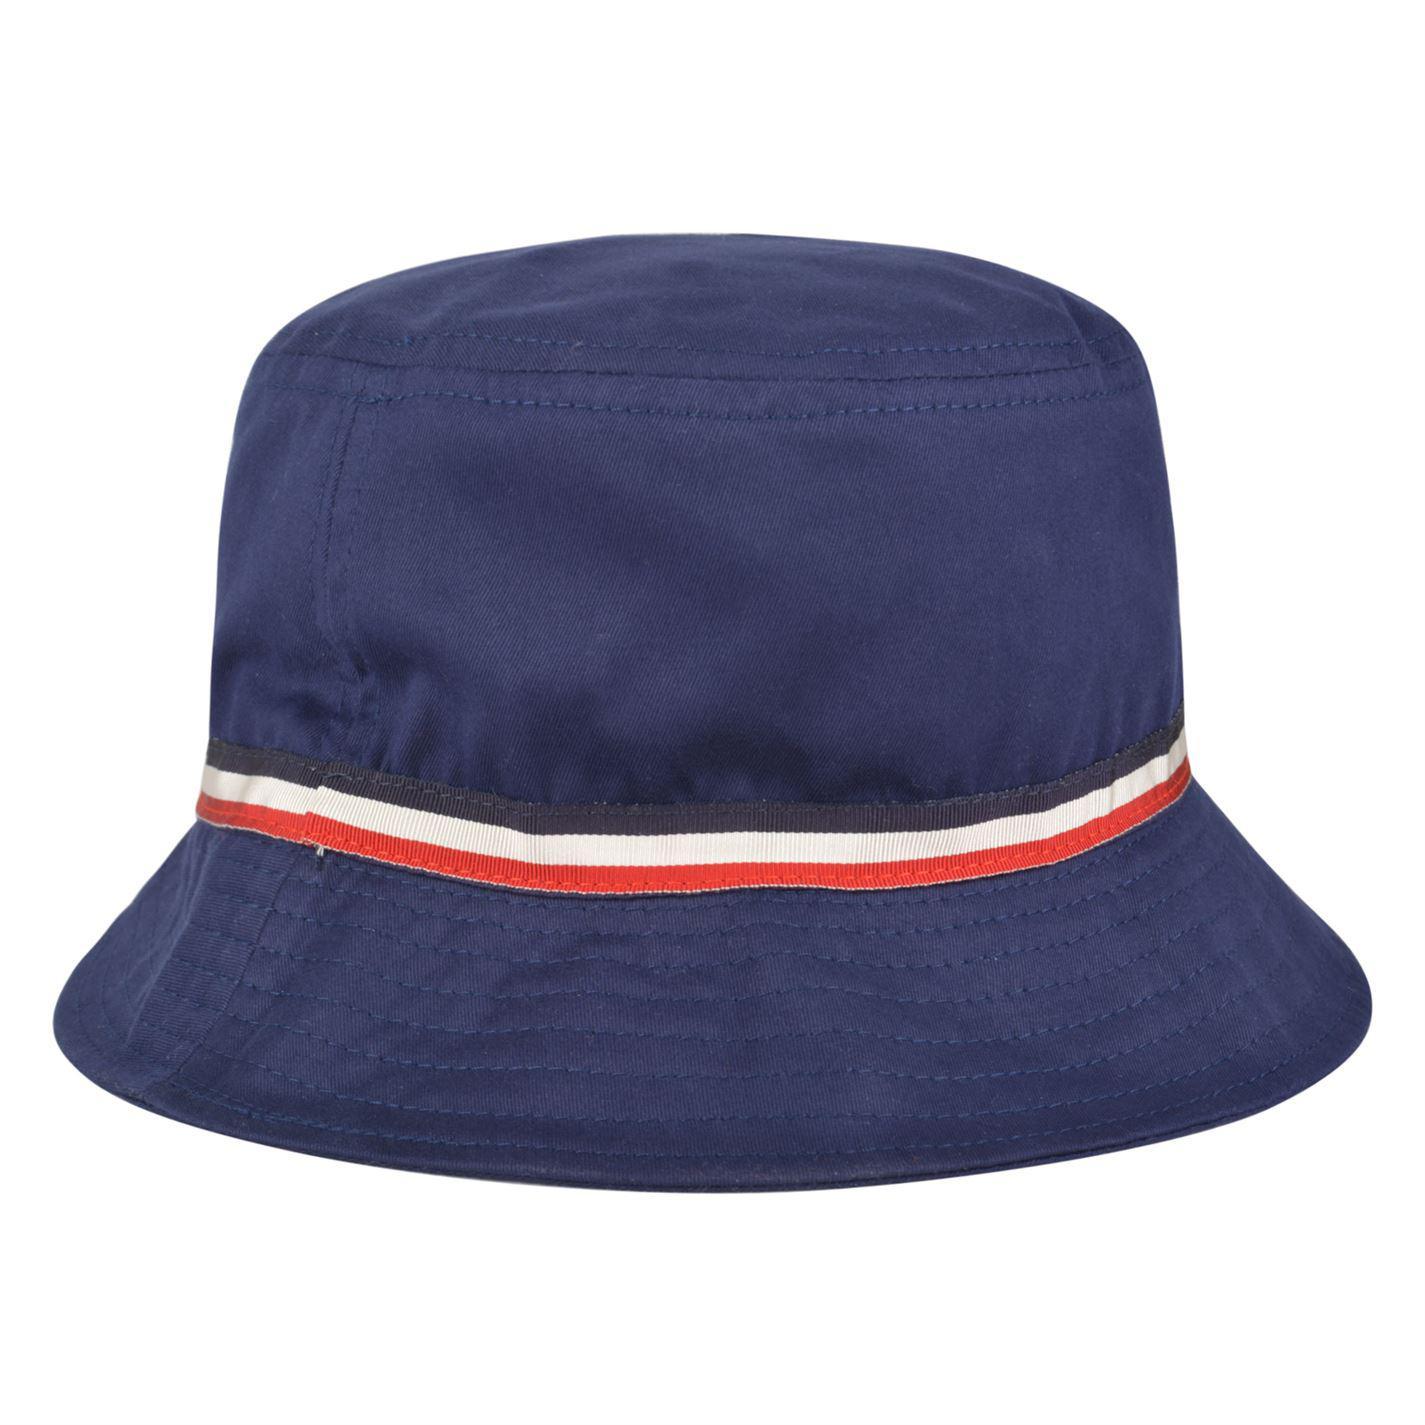 f89ab5eb73d4 Lyst - Moncler Stripe Trim Bucket Hat in Blue for Men